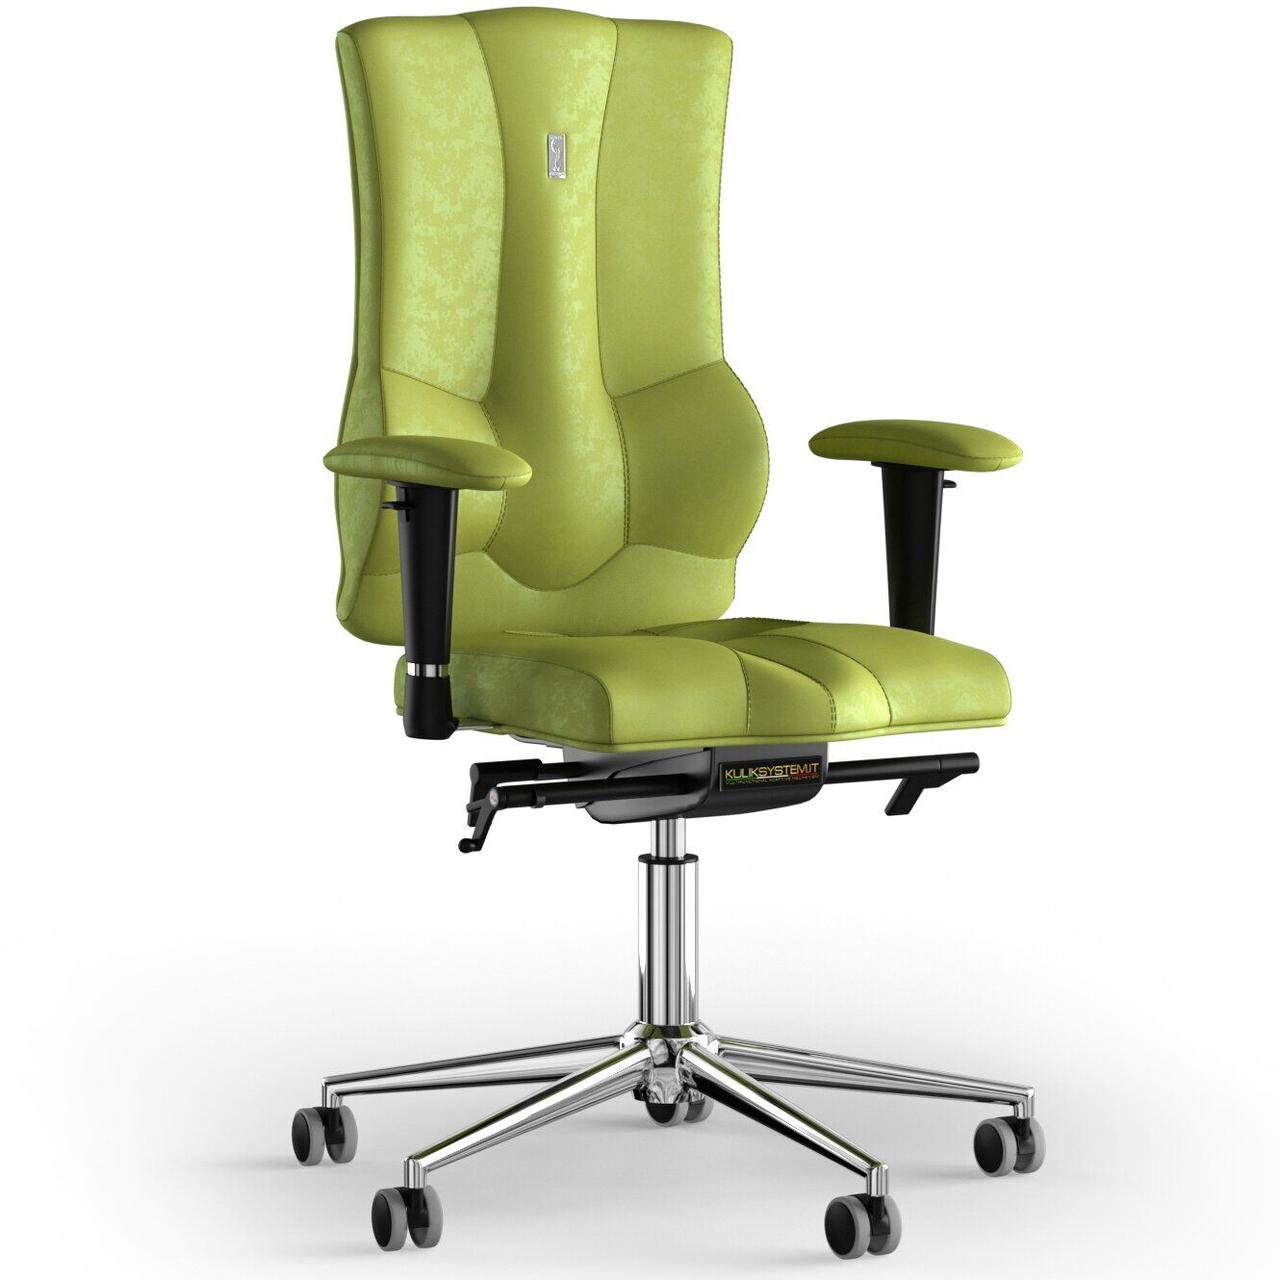 Кресло KULIK SYSTEM ELEGANCE Антара без подголовника без строчки Оливковый (10-909-BS-MC-0303)